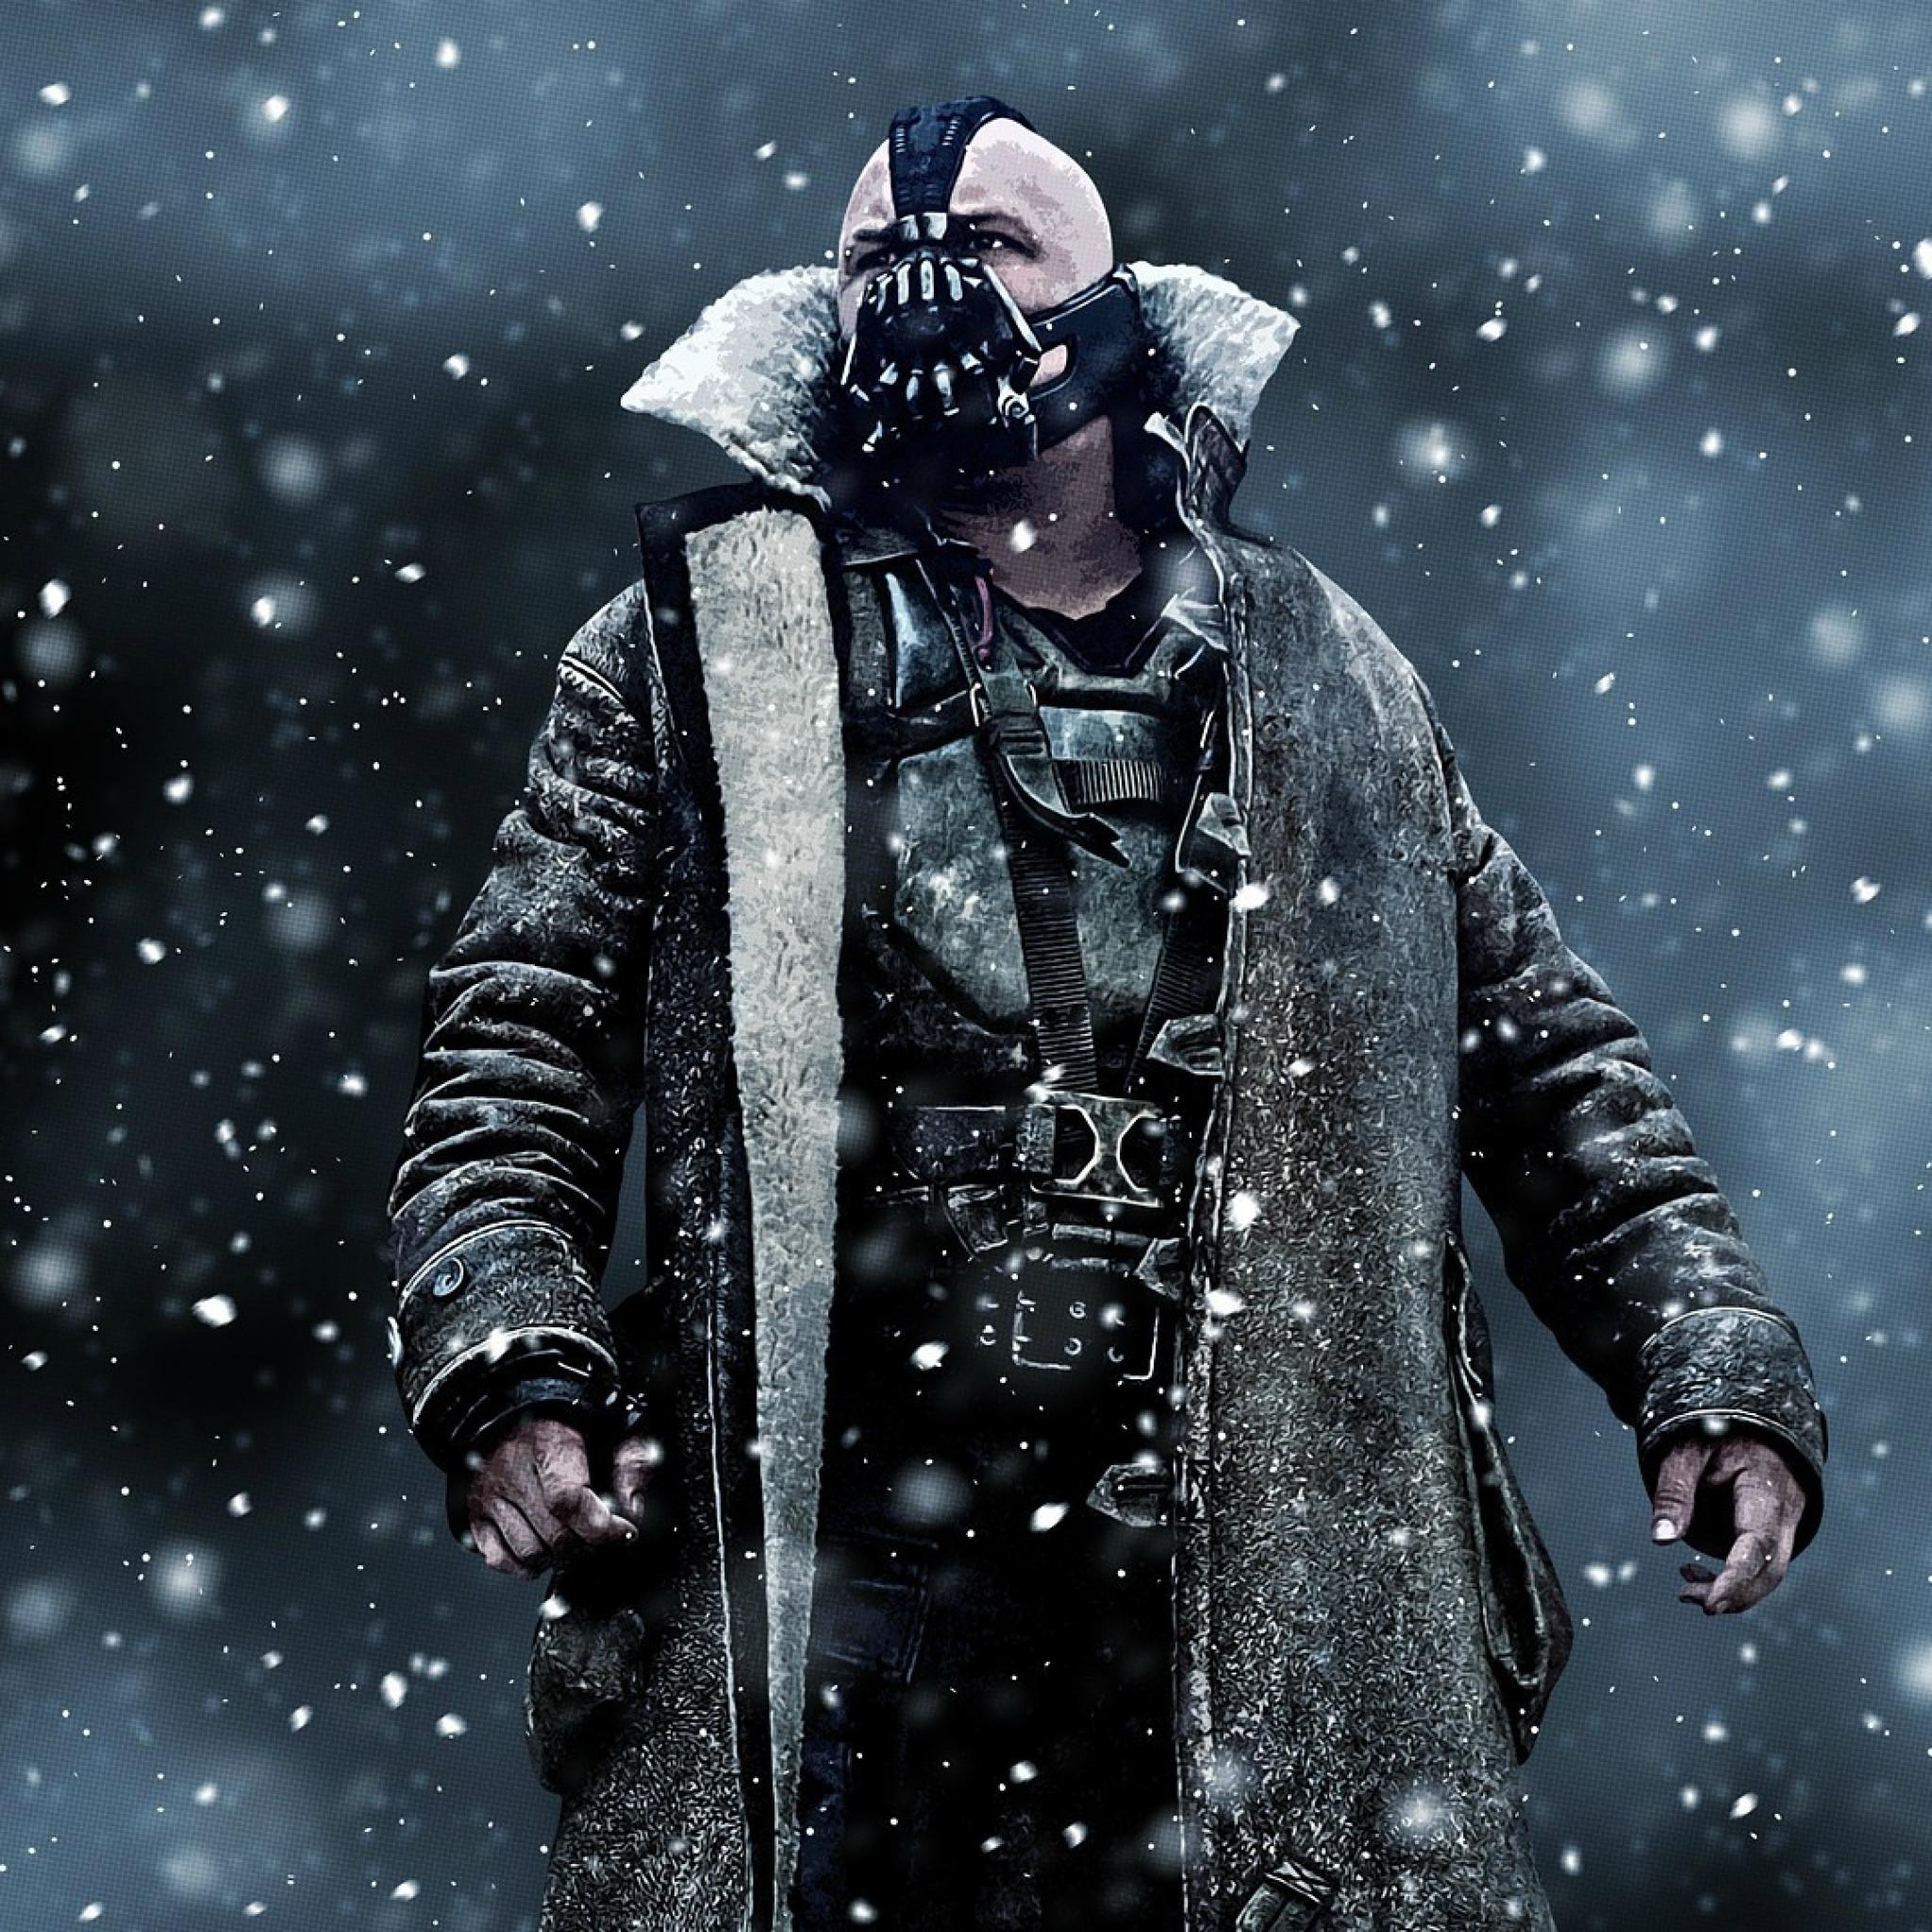 Wallpaper The Dark Knight Rises Bane Art Mask 2048x2048 Wallpaper Teahub Io